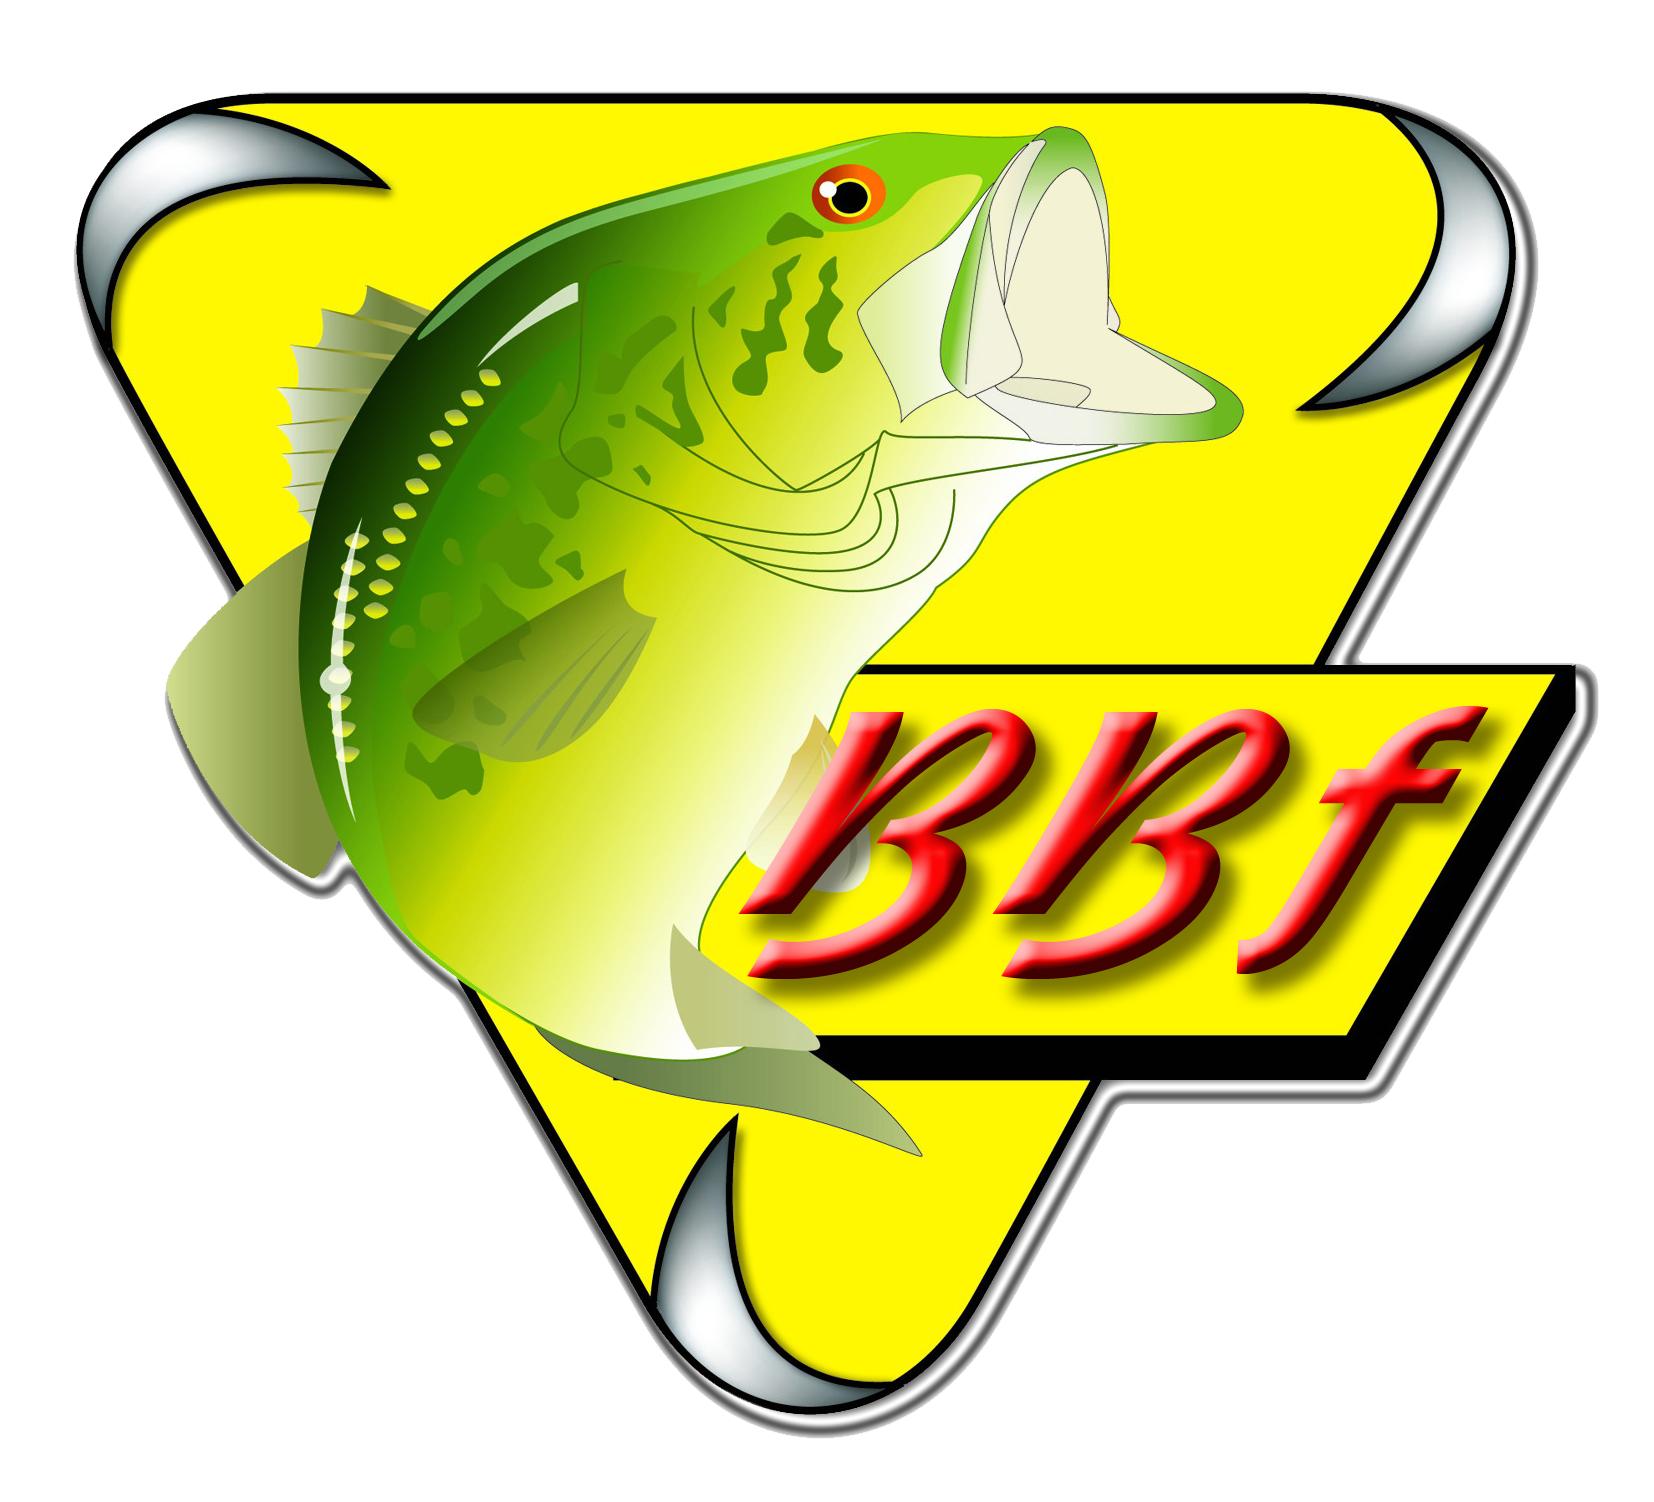 Logobbf2006 hi def detoure apres